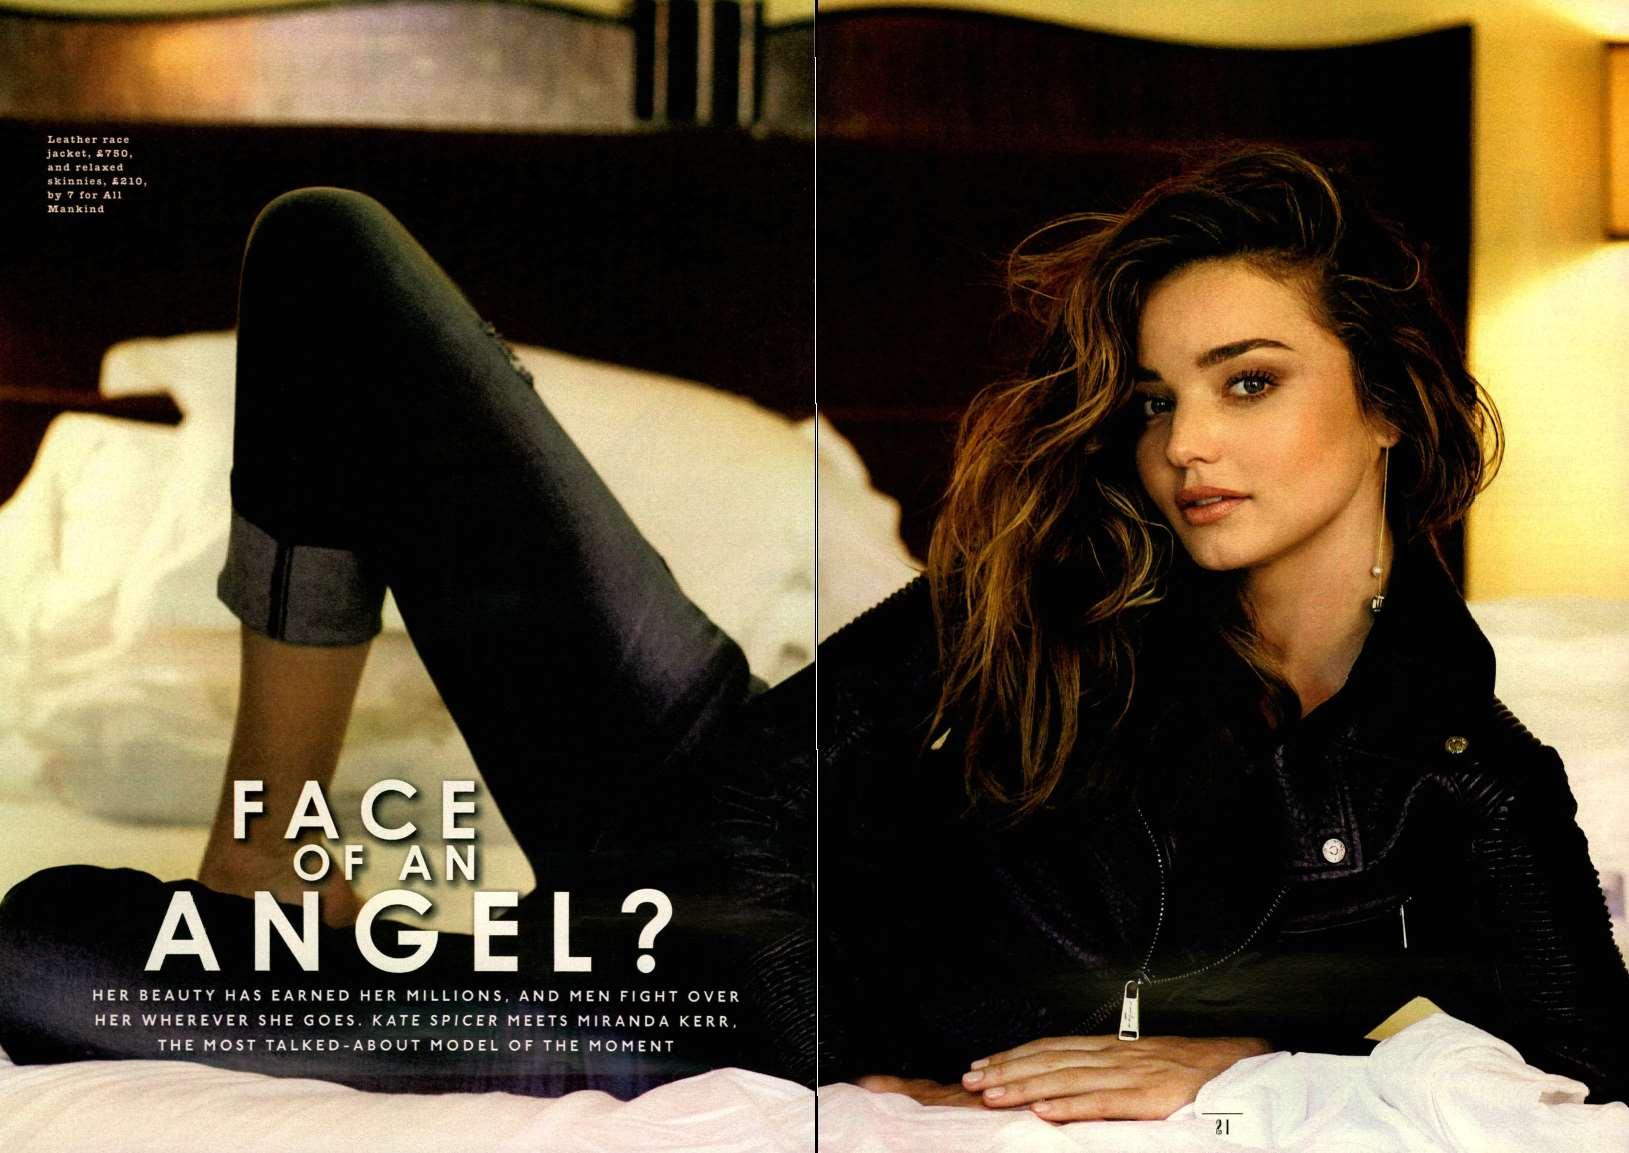 Miranda Kerr - Page 1227 - Fashion Models - Bellazon Miranda Kerr Bellazon